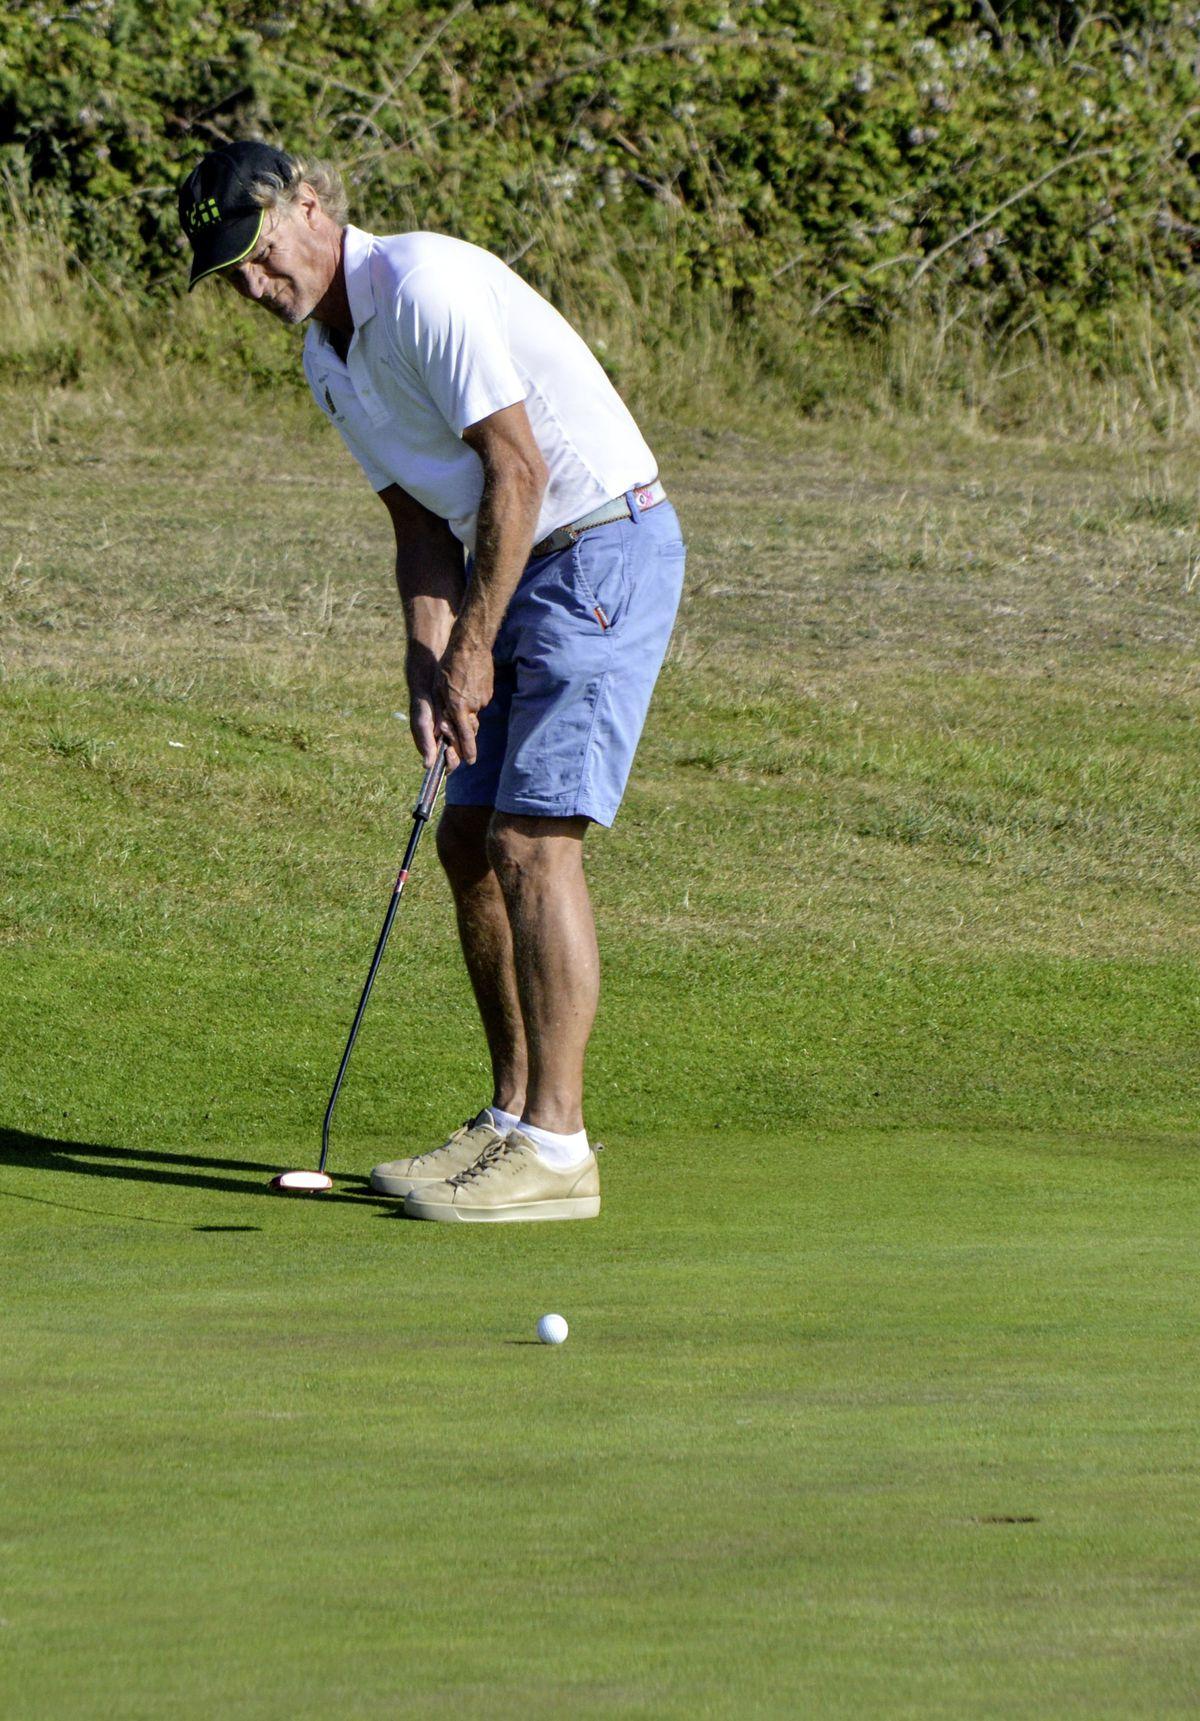 Daniel Griggs putting for birdie. (Picture by Gareth Le Prevost, 28541122)